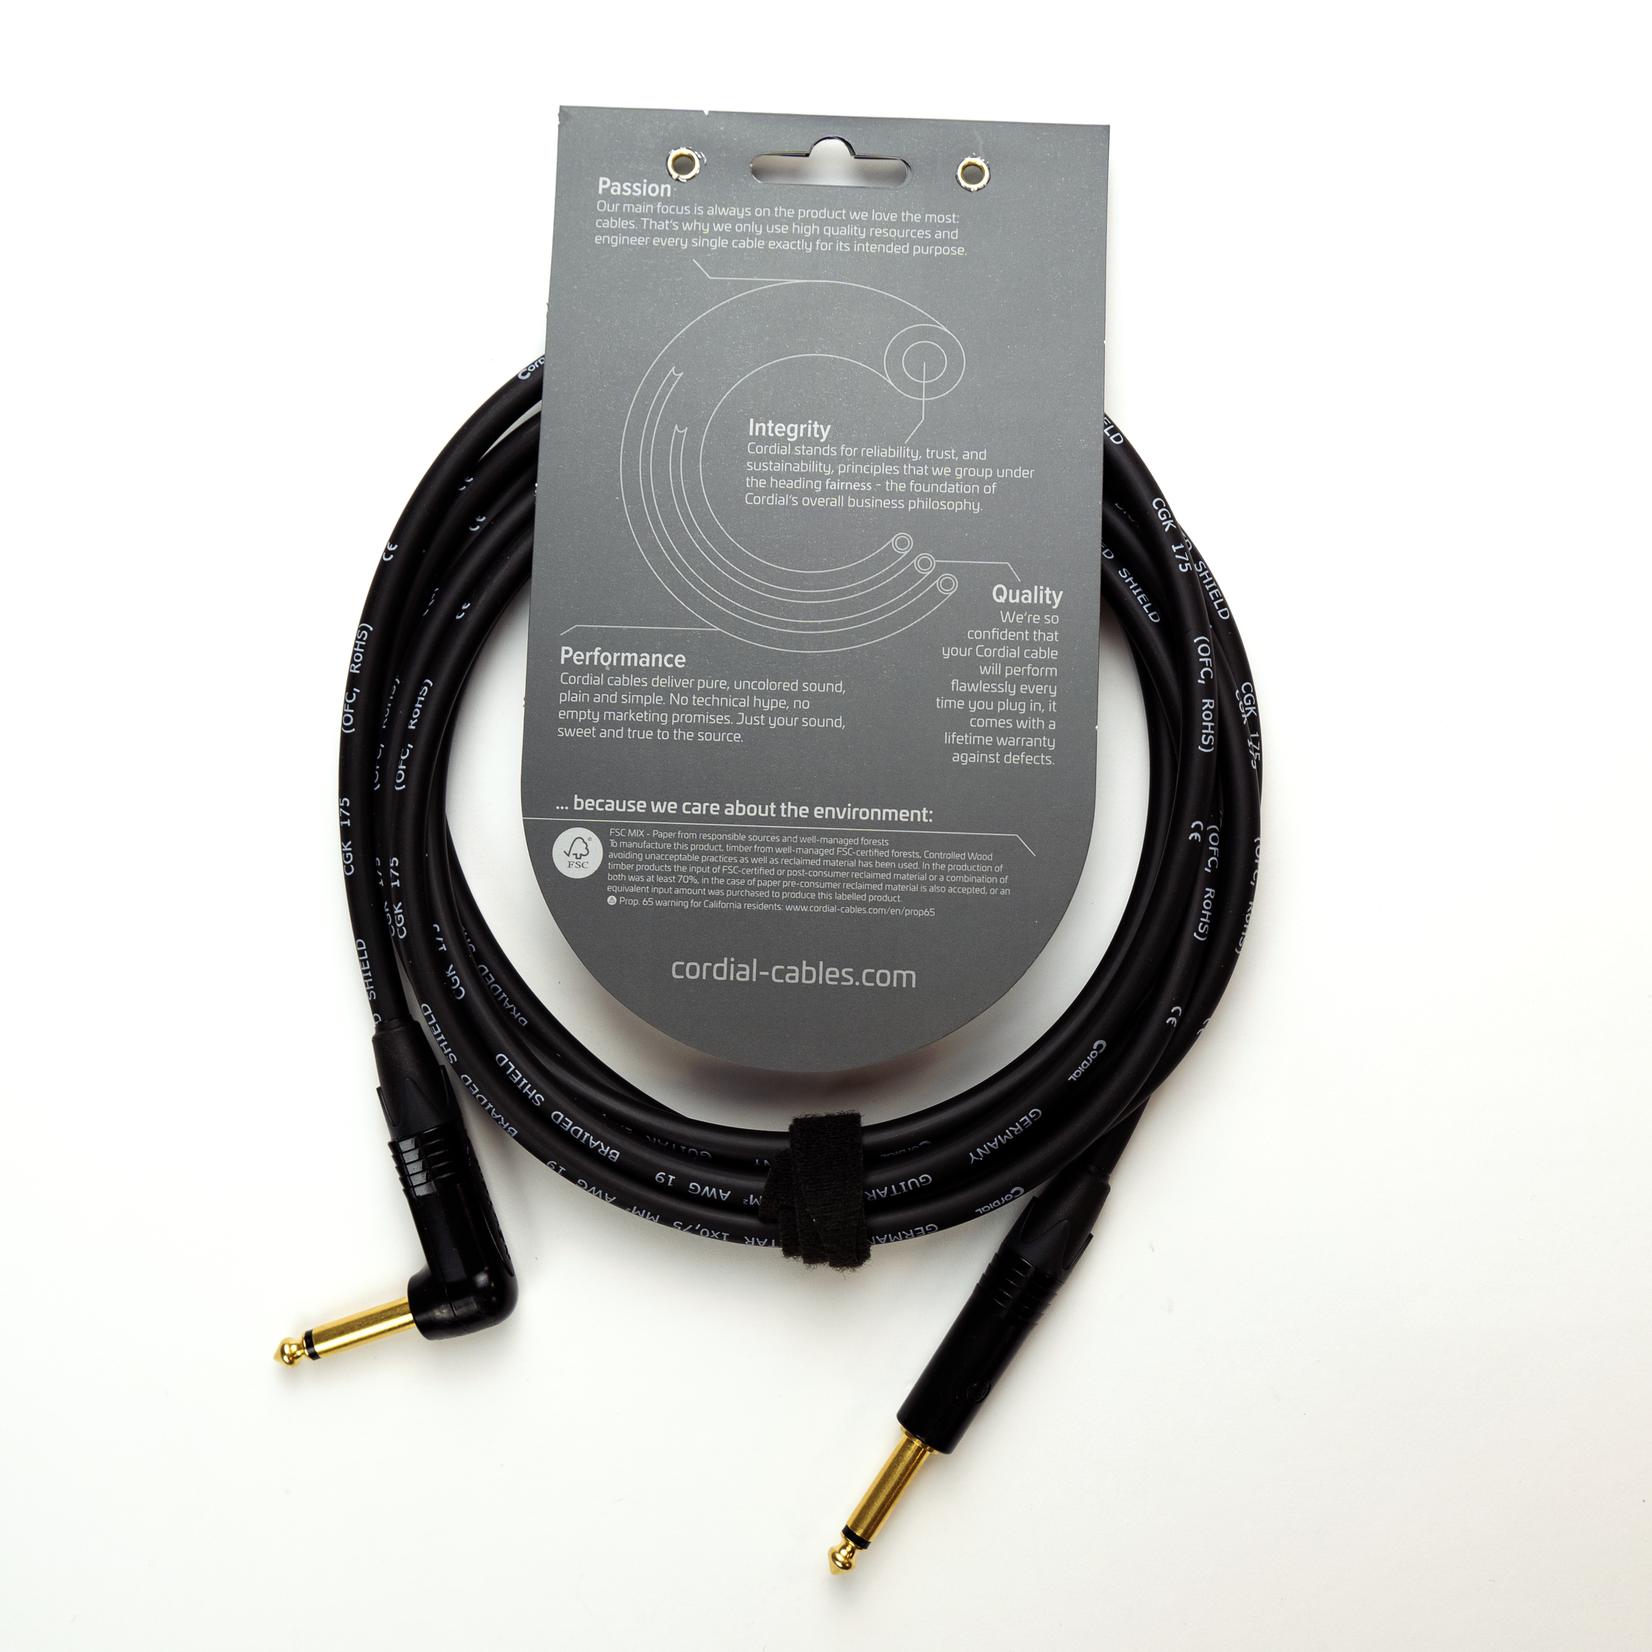 Cordial Cables Cordial 6m (20-foot) Premium High-Copper Instrument Cable, 1/4 Straight-to-Angle Neutrik Connectors (CSI 6 PR 175)